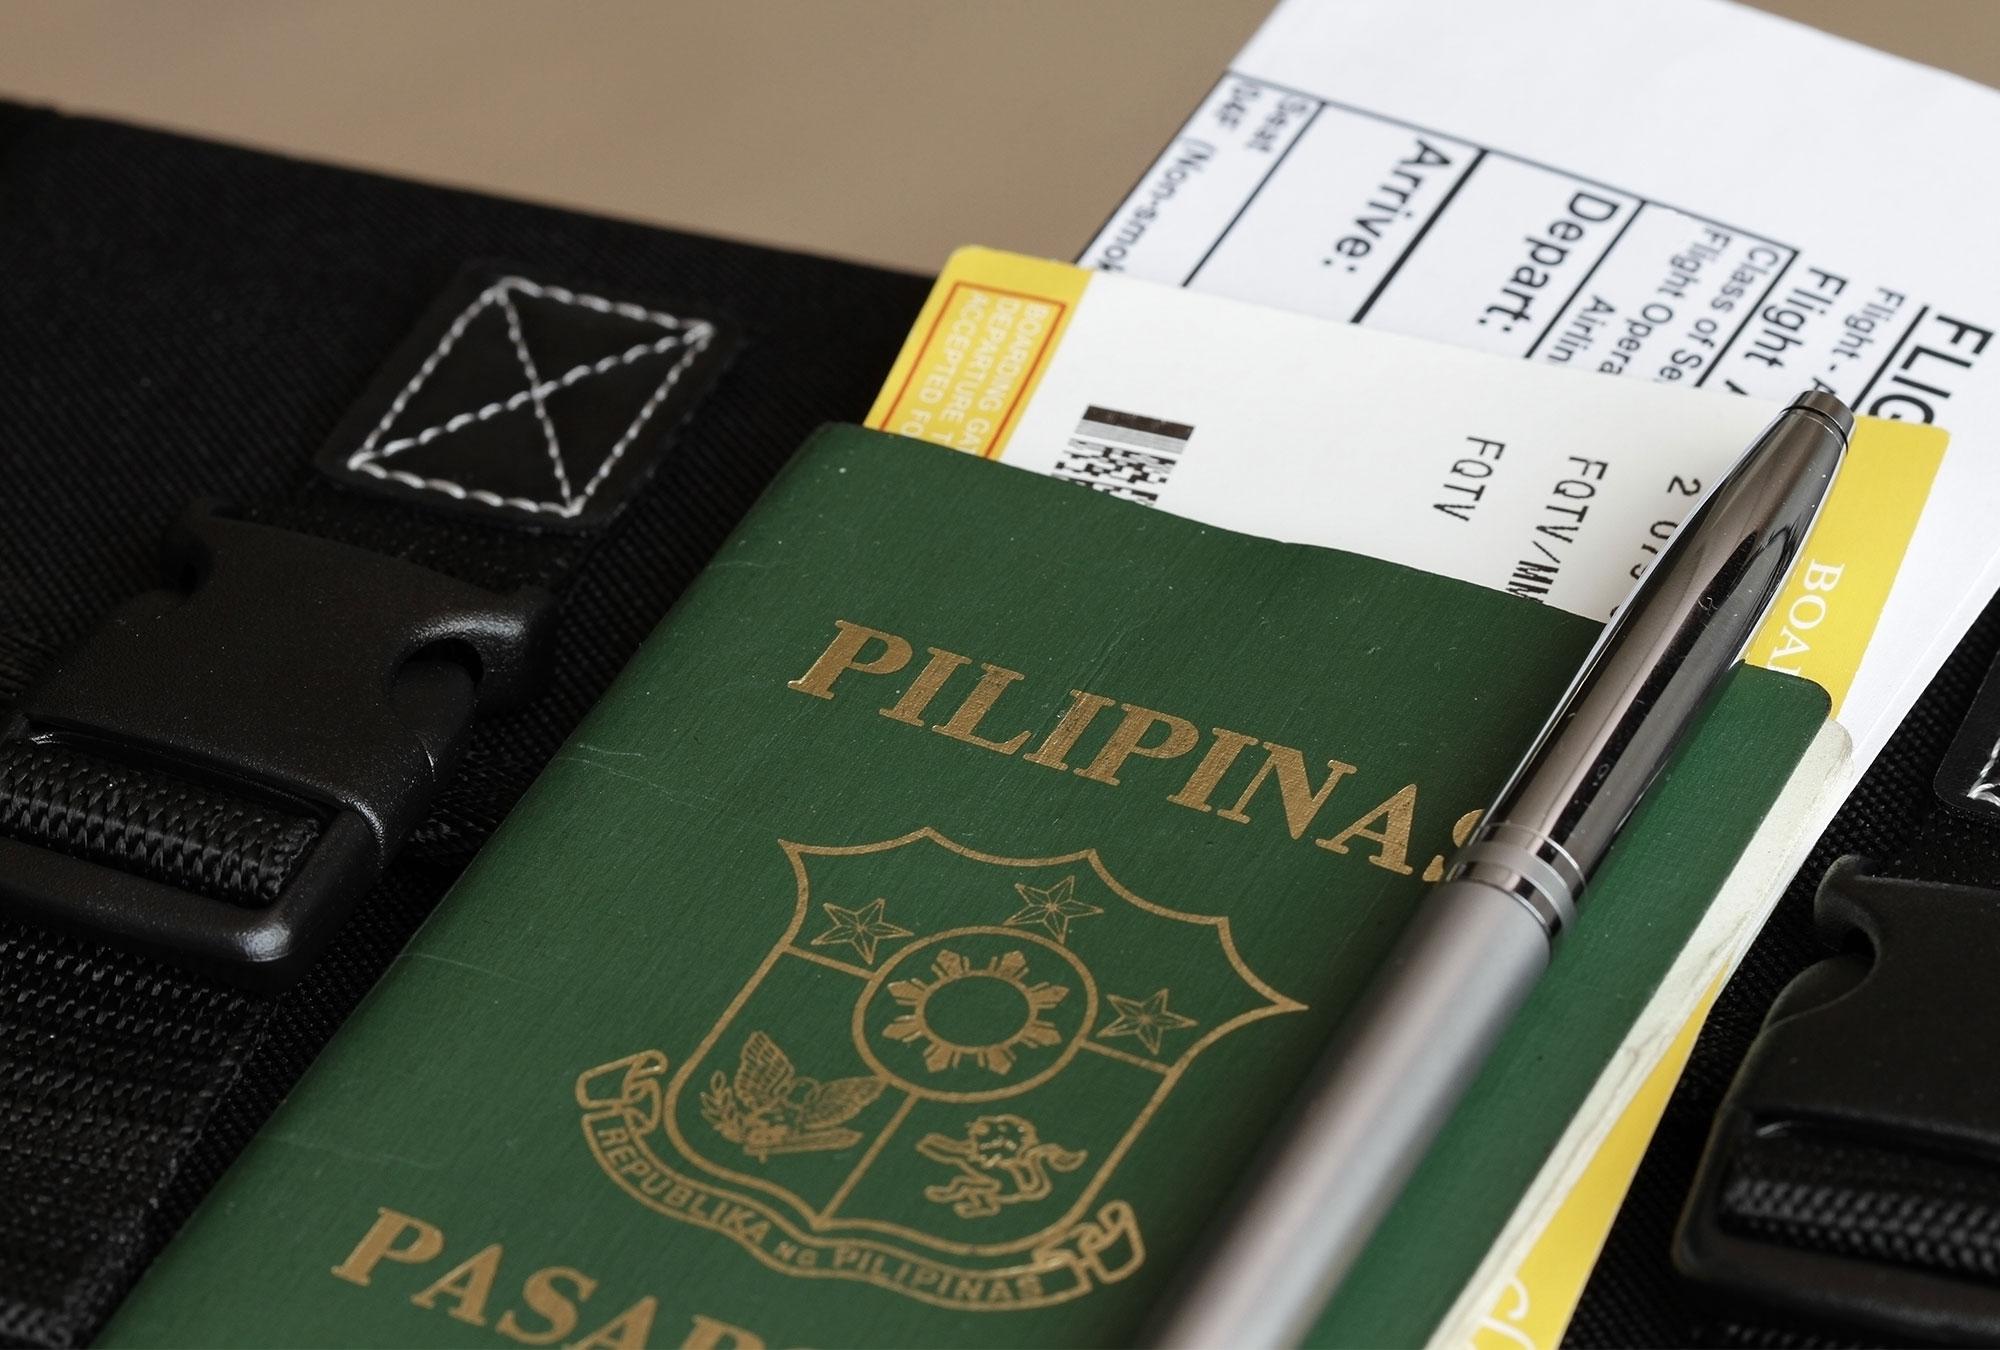 Pilipinas passport with flight ticket inside